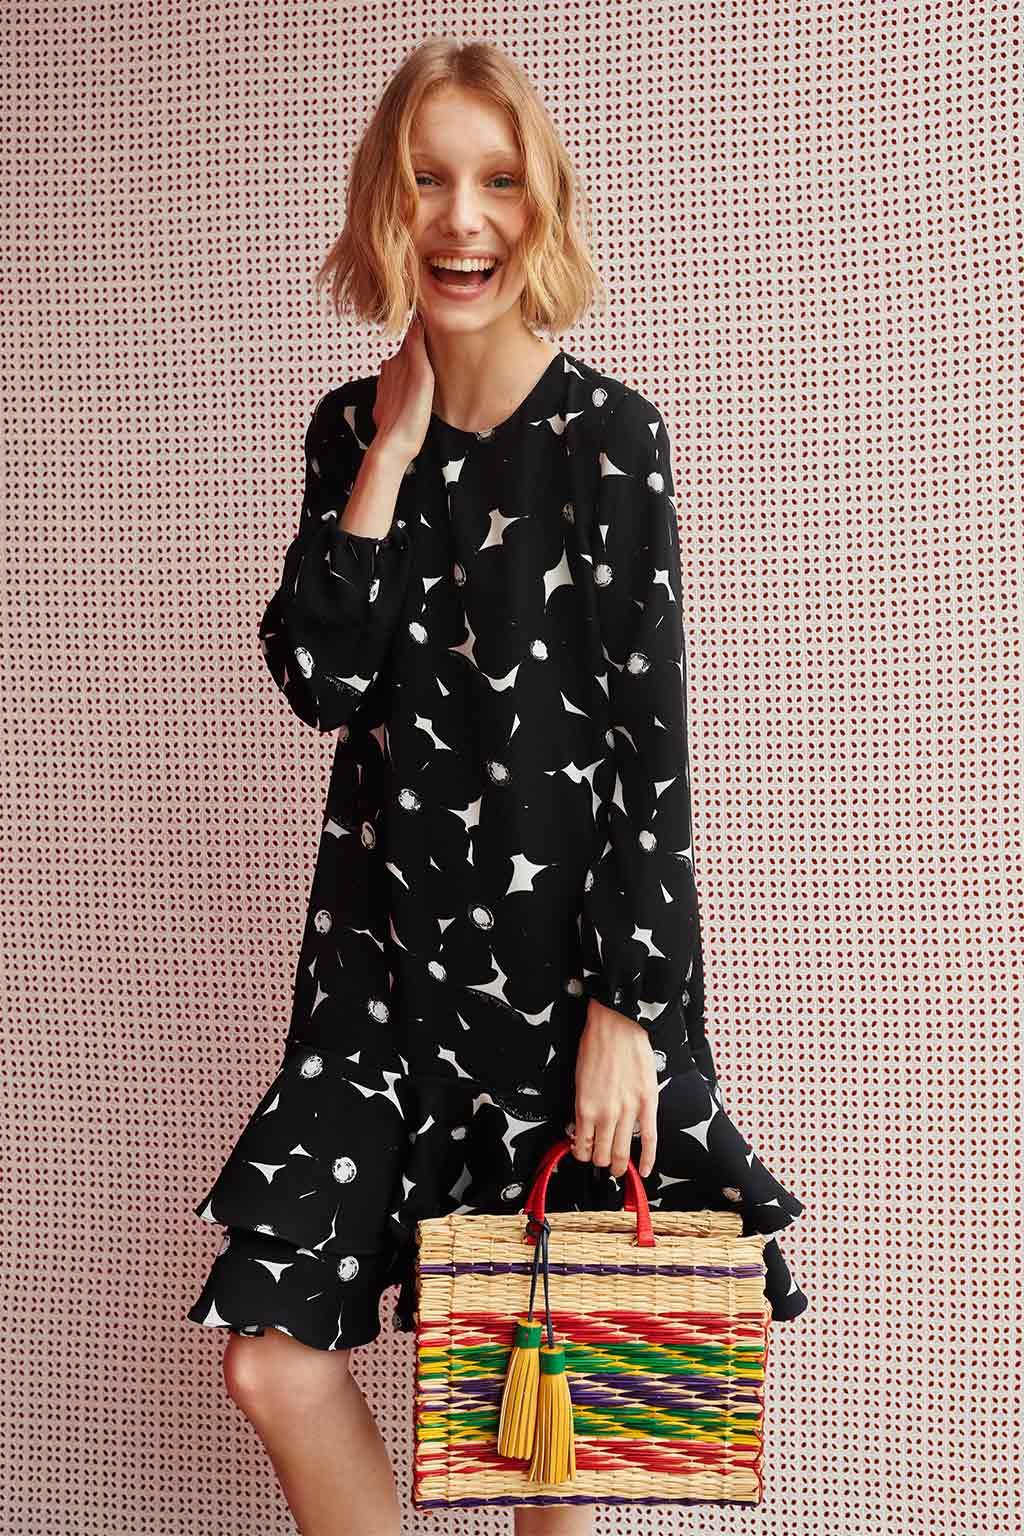 CH Carolina Herrera. New Womenswear Collection Summer. Look 11